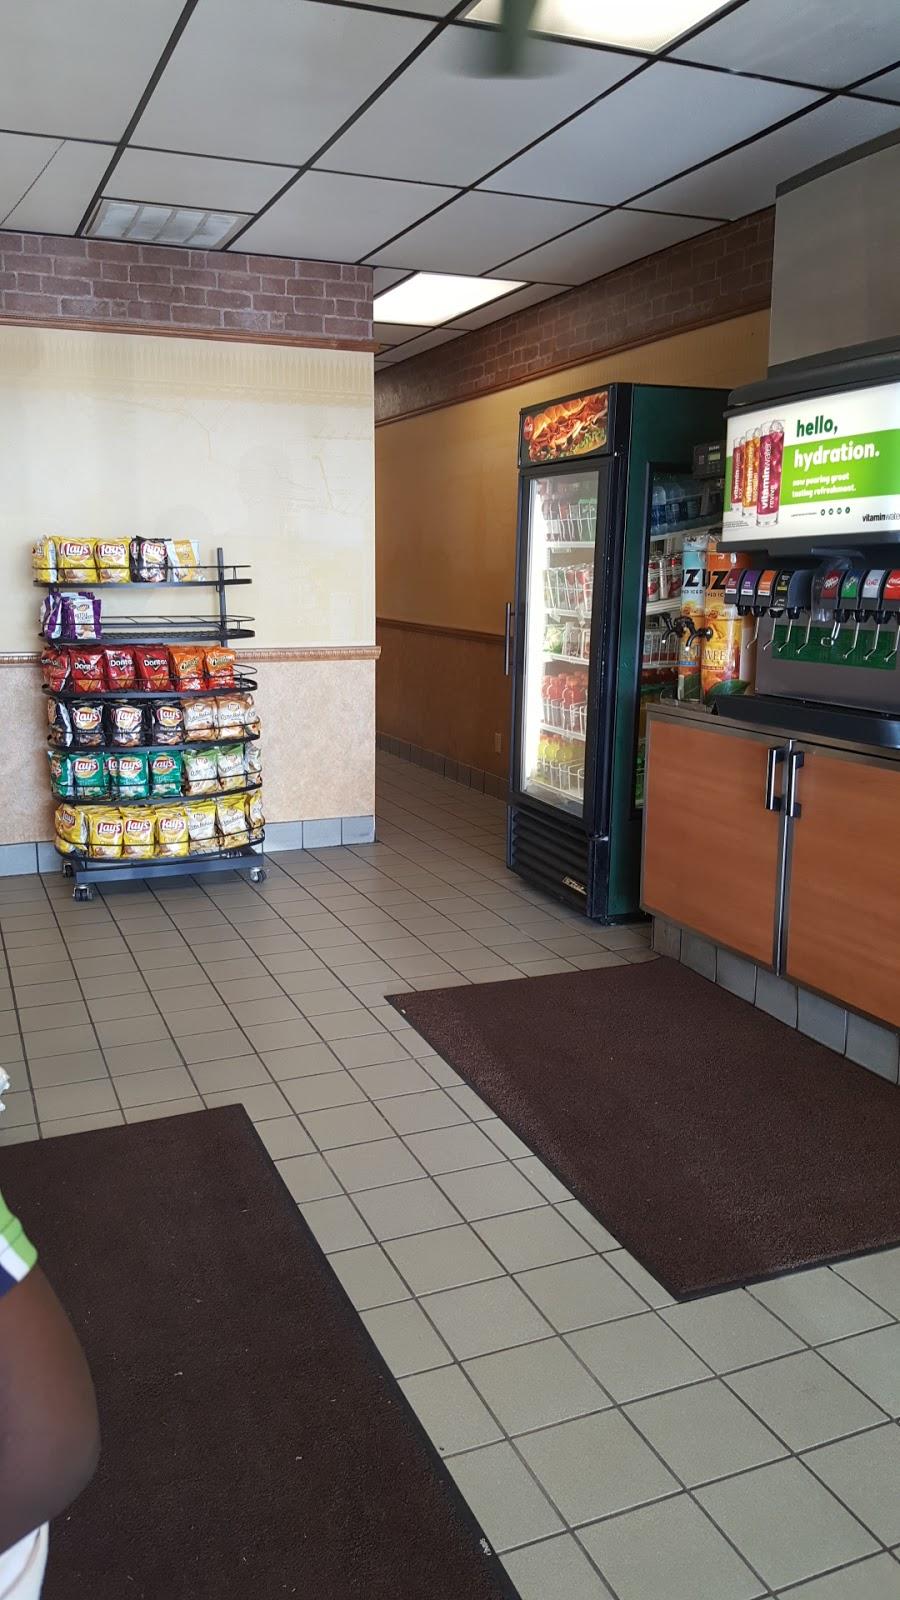 Subway Restaurants - restaurant    Photo 7 of 10   Address: 109 W Ovilla Rd, Red Oak, TX 75154, USA   Phone: (972) 230-7850